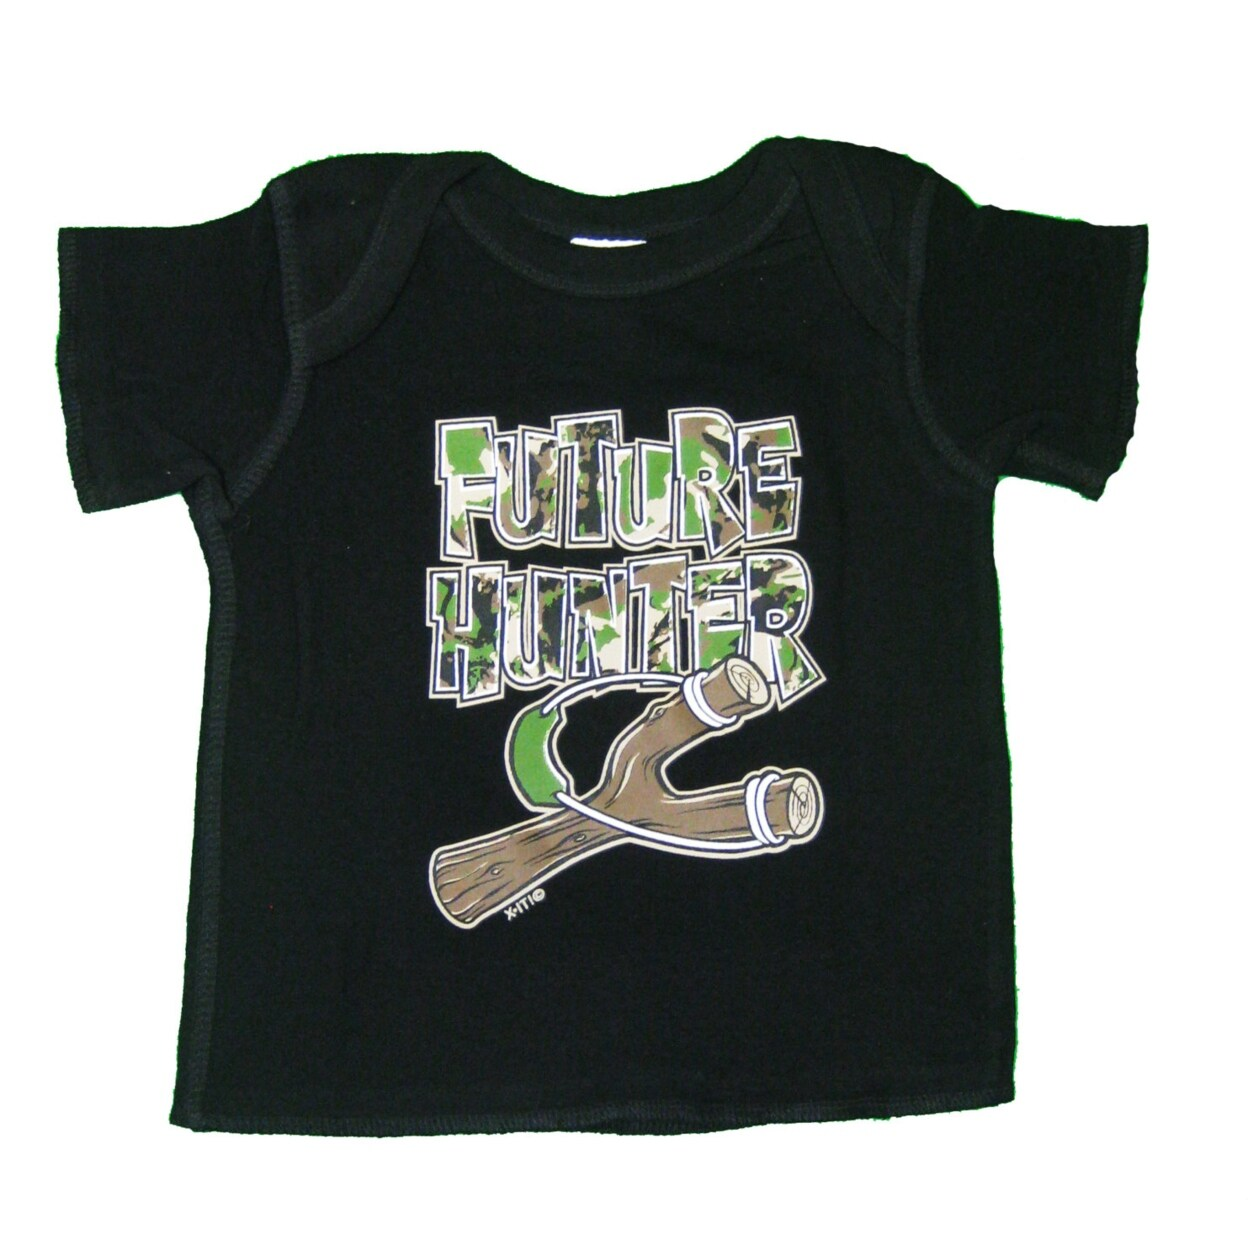 Infant Black Future Hunter Tee, Cute Tees, Boys Shirt, Toddler Shirt, Girls Shirt,born, Funny Tee, Unisex Shirt, Hunter Tee (12-18 months)